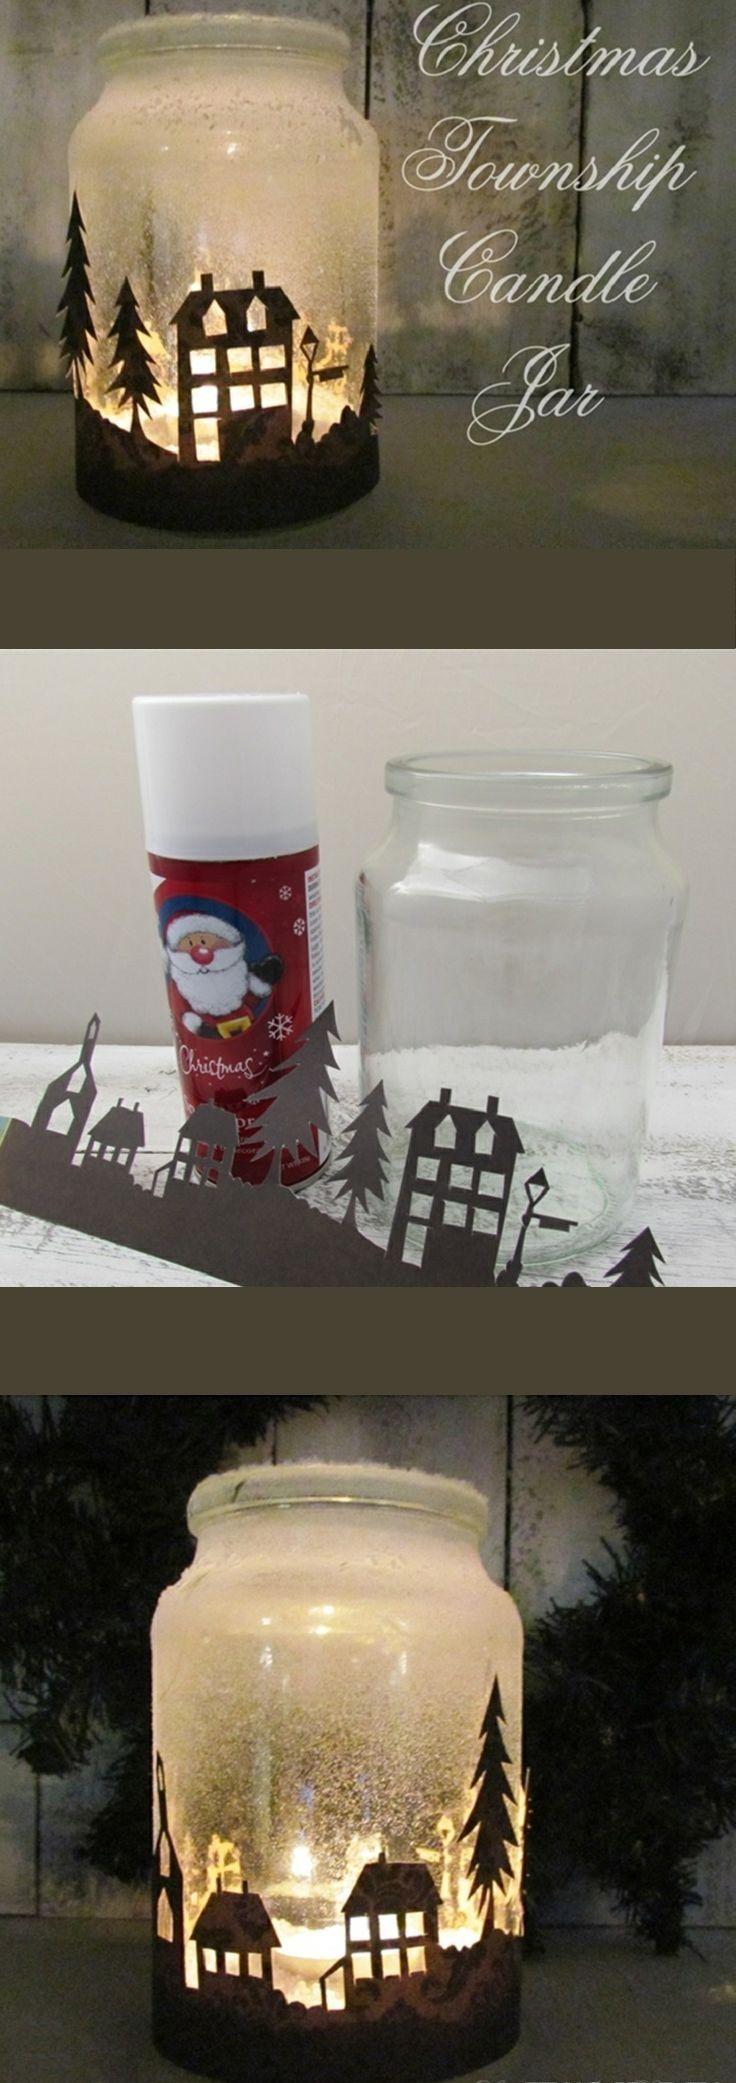 Diy Amazing and Quick Christmas Ideas   Diy & Crafts Ideas Magazine